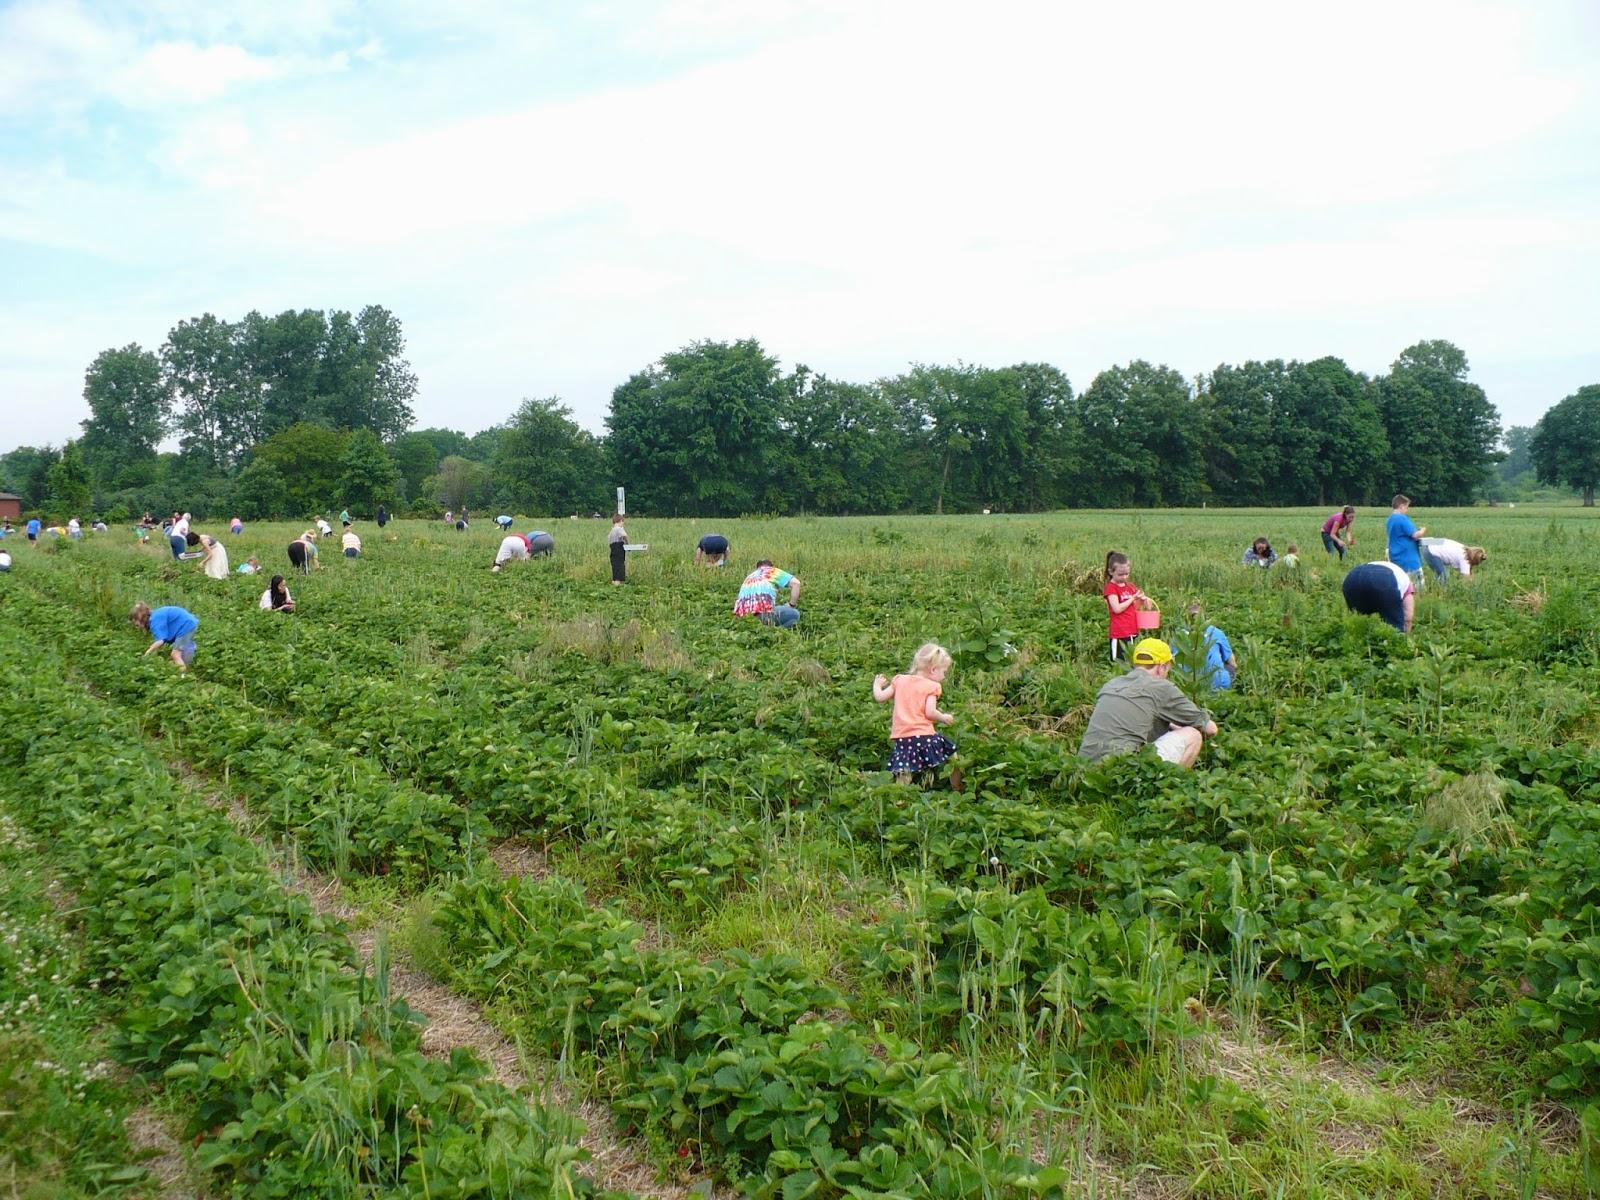 Strawberry Picking At Rowe S Produce Farm And Strawberry Freezer Jam Recipe Brooke Romney Writes